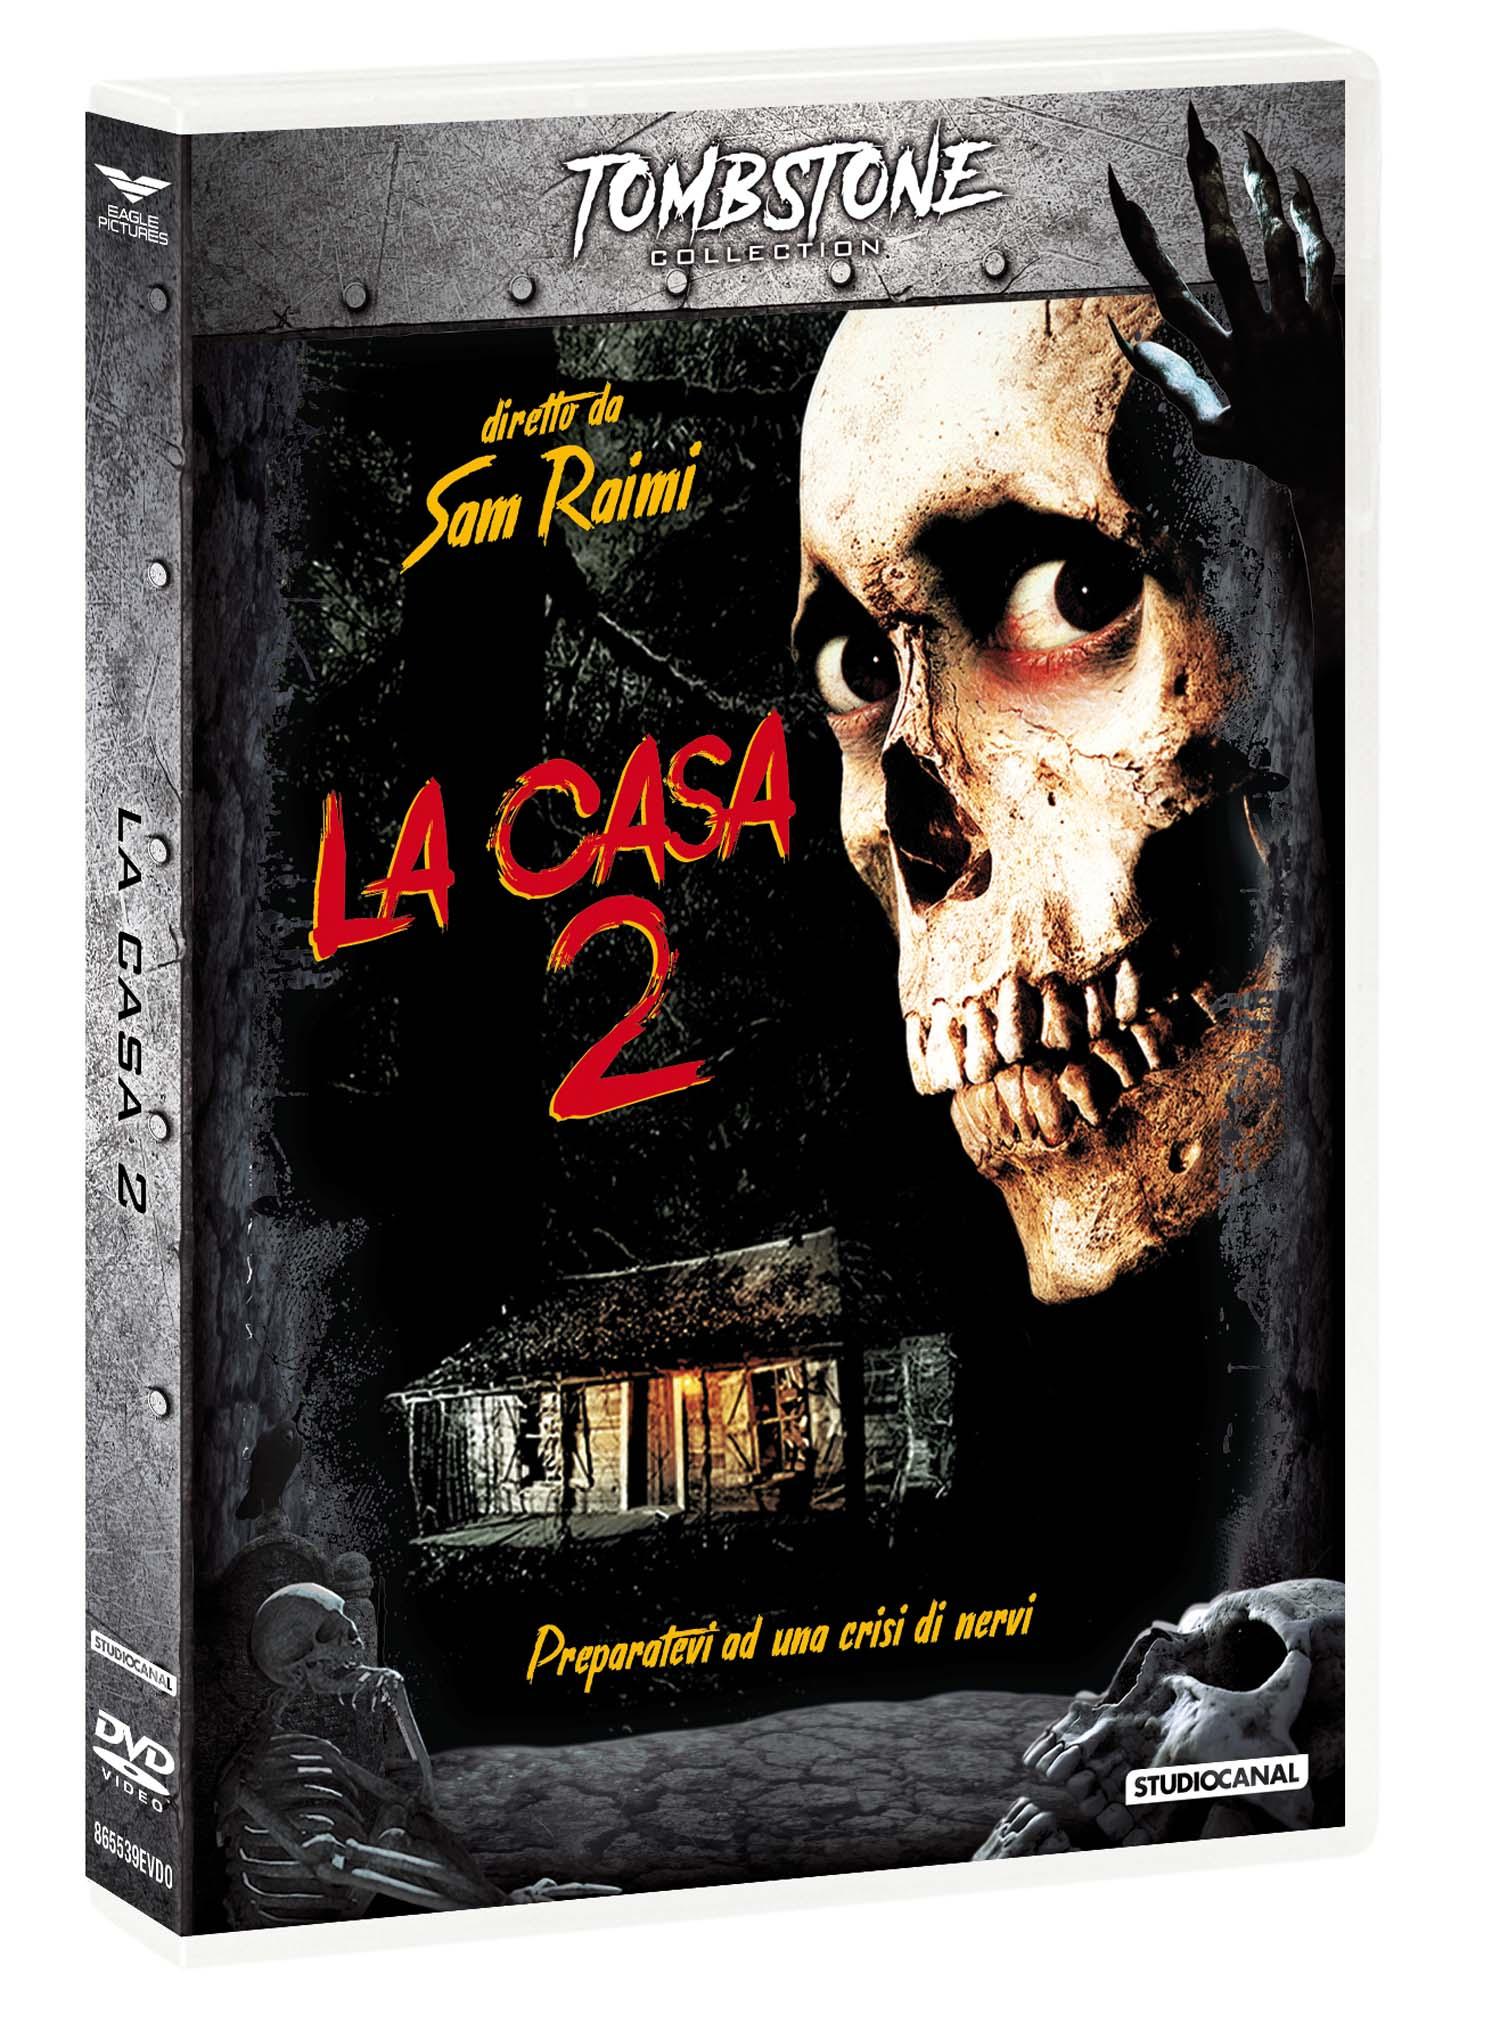 LA CASA 2 (TOMBSTONE) (DVD)